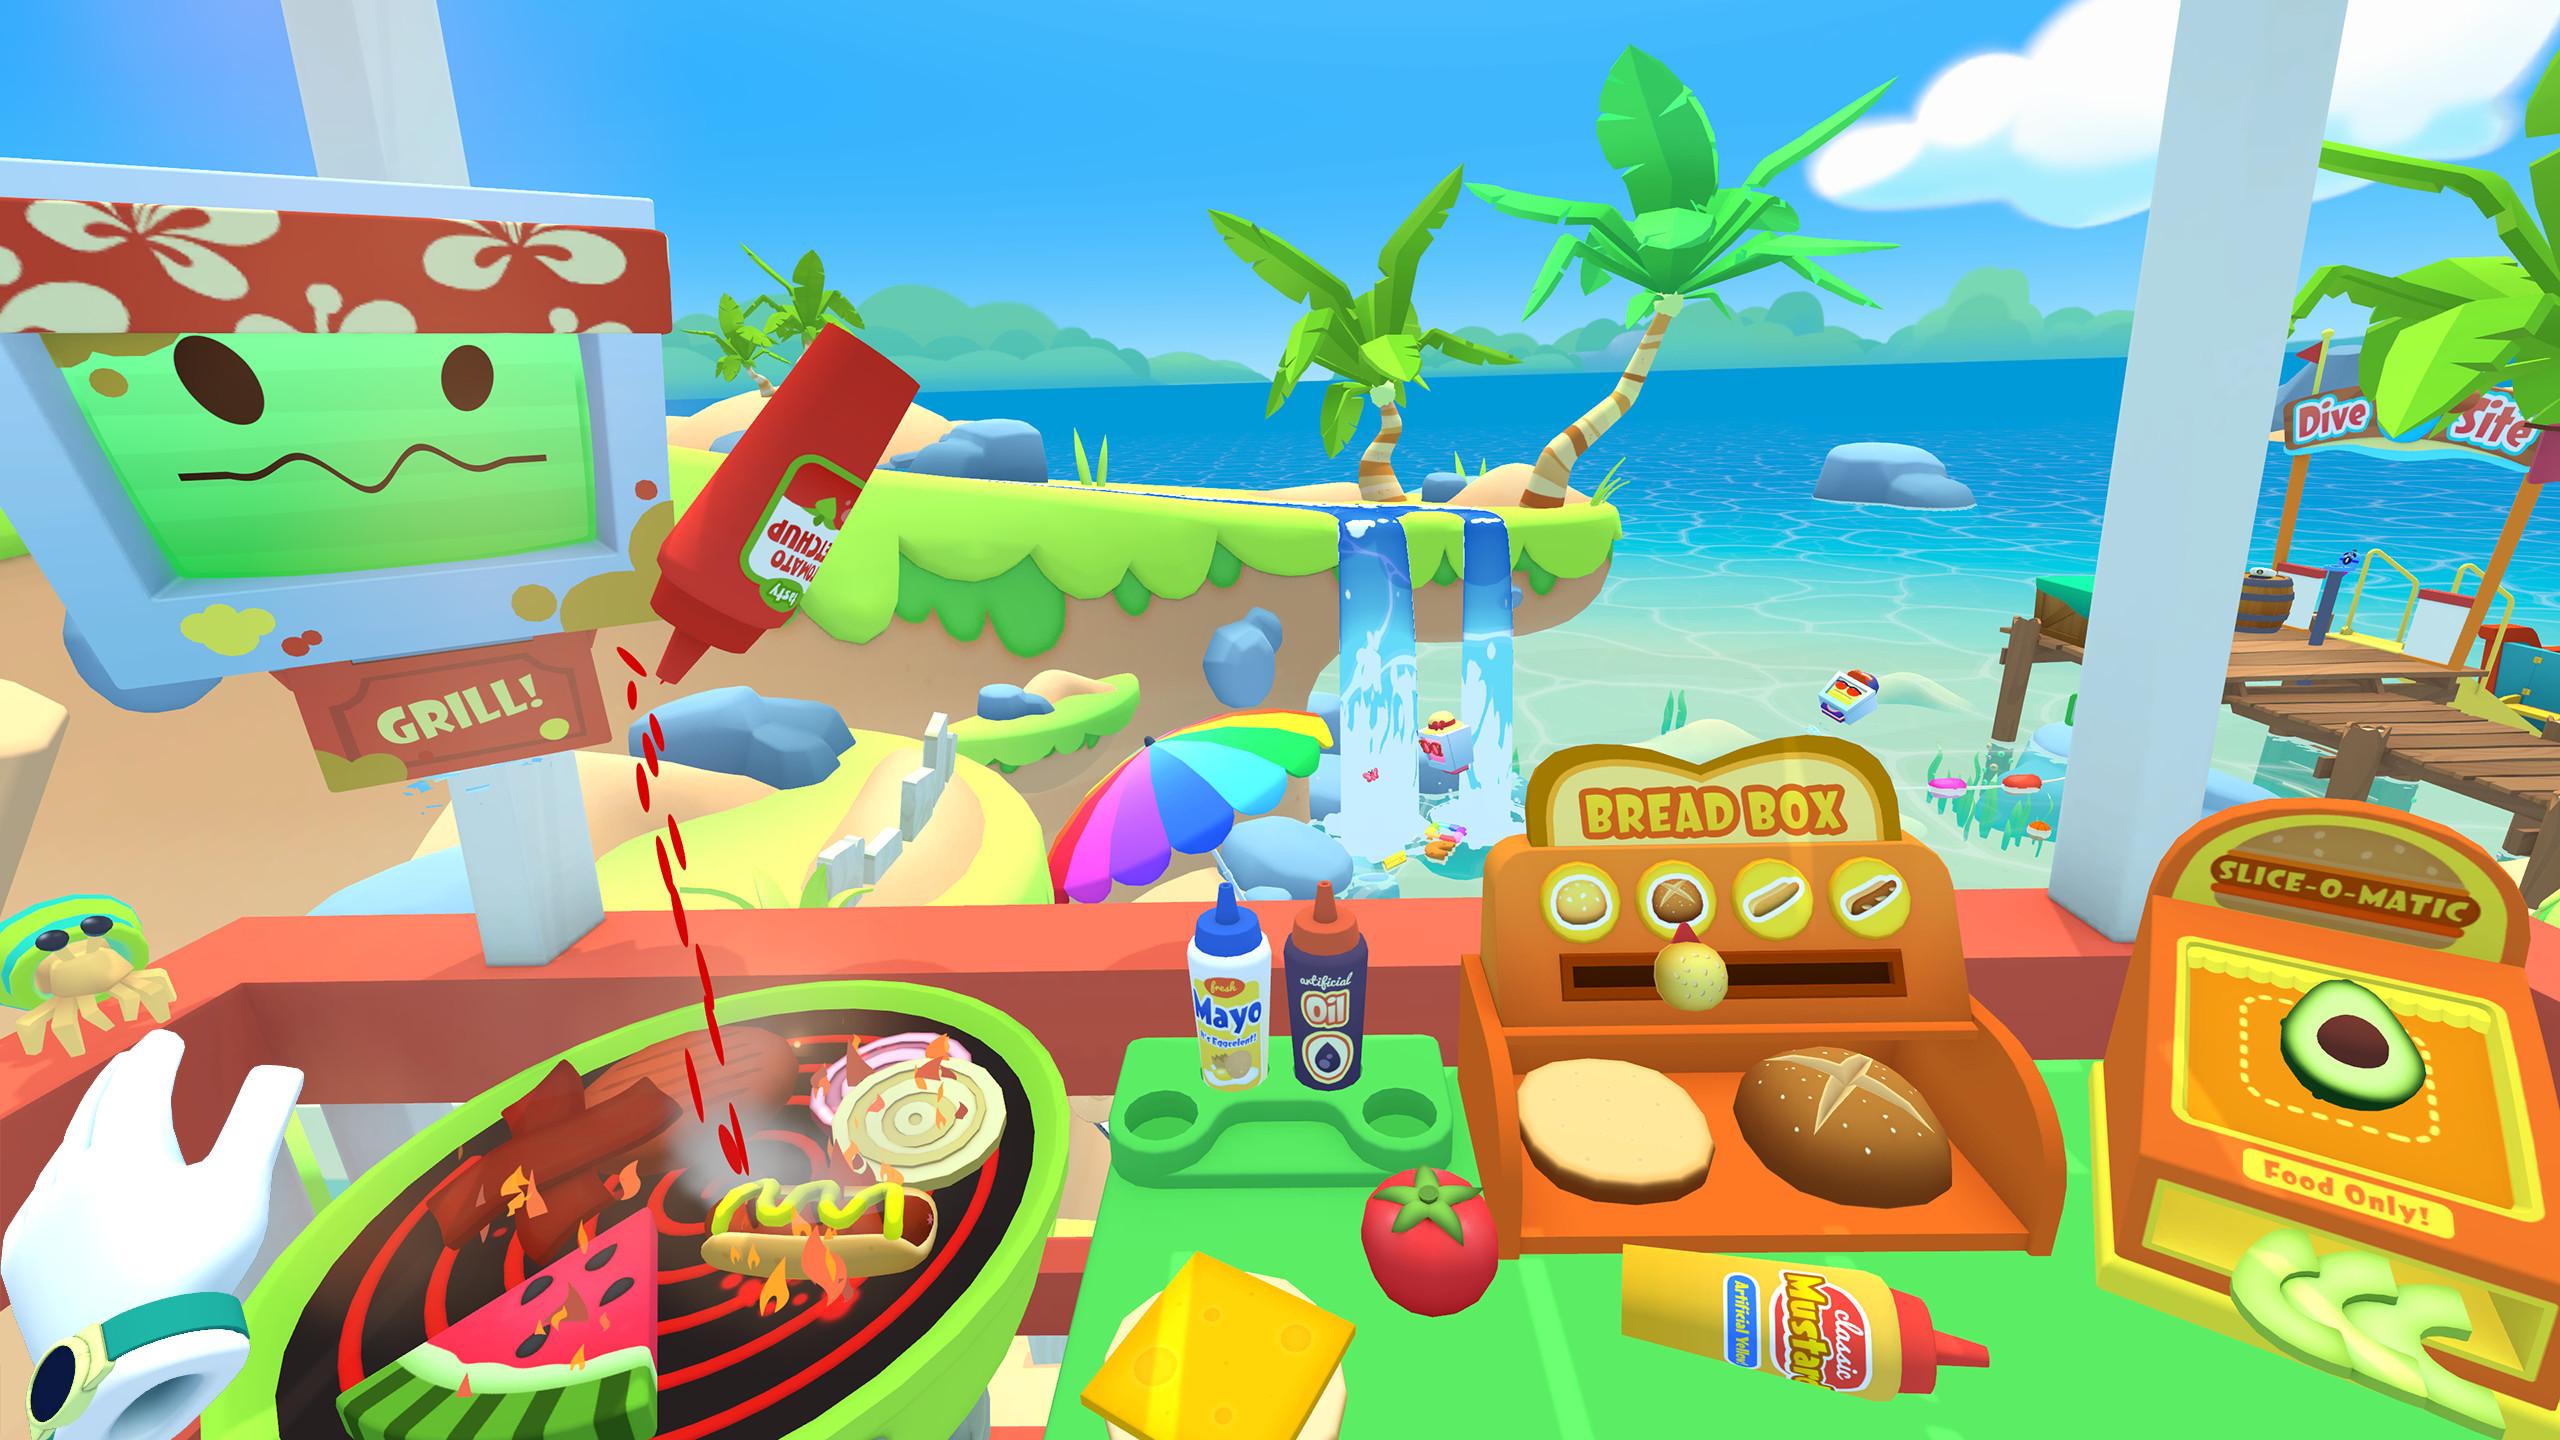 Vacation-Simulator-Oculus-Rift-HTC-Vive-Windows-VR-PlayStation-VR-PSVR-Steam